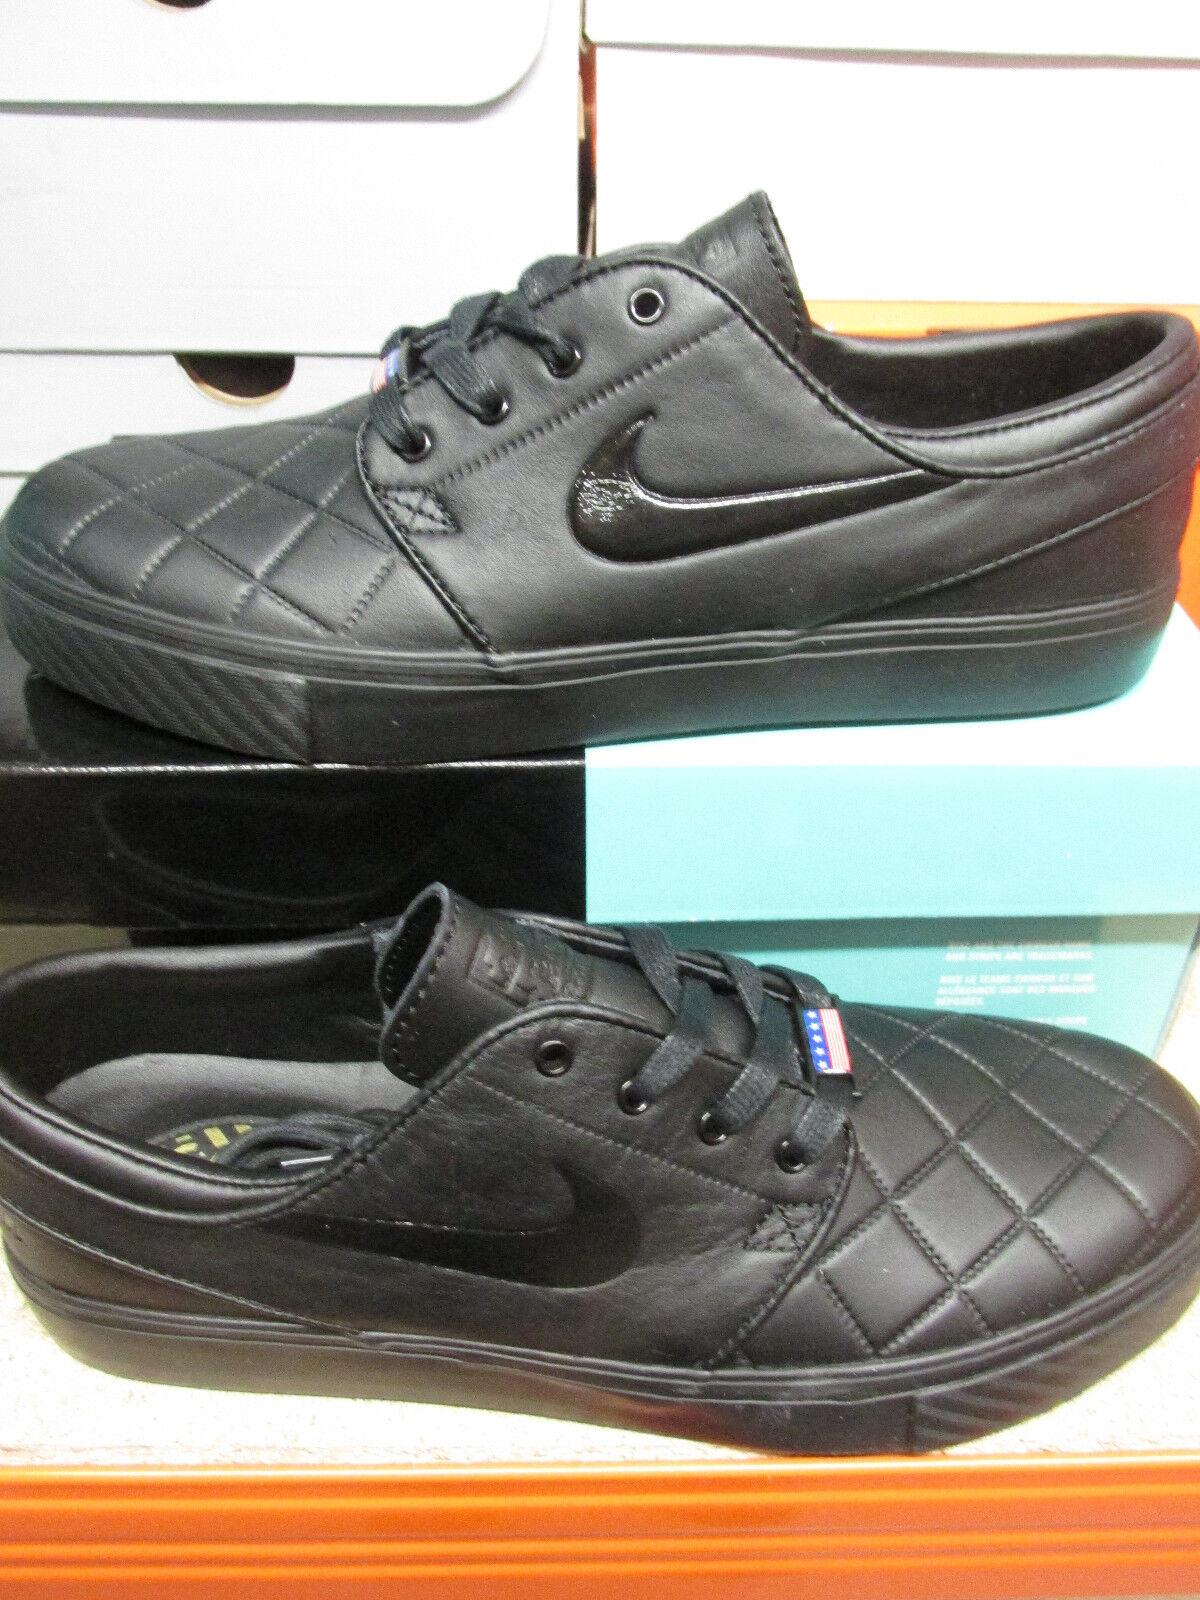 Nike Sb Zoom Stefan Janoski Elt 006 Sbxfb Baskets Hommes 833600 006 Elt Baskets 1a8bcf